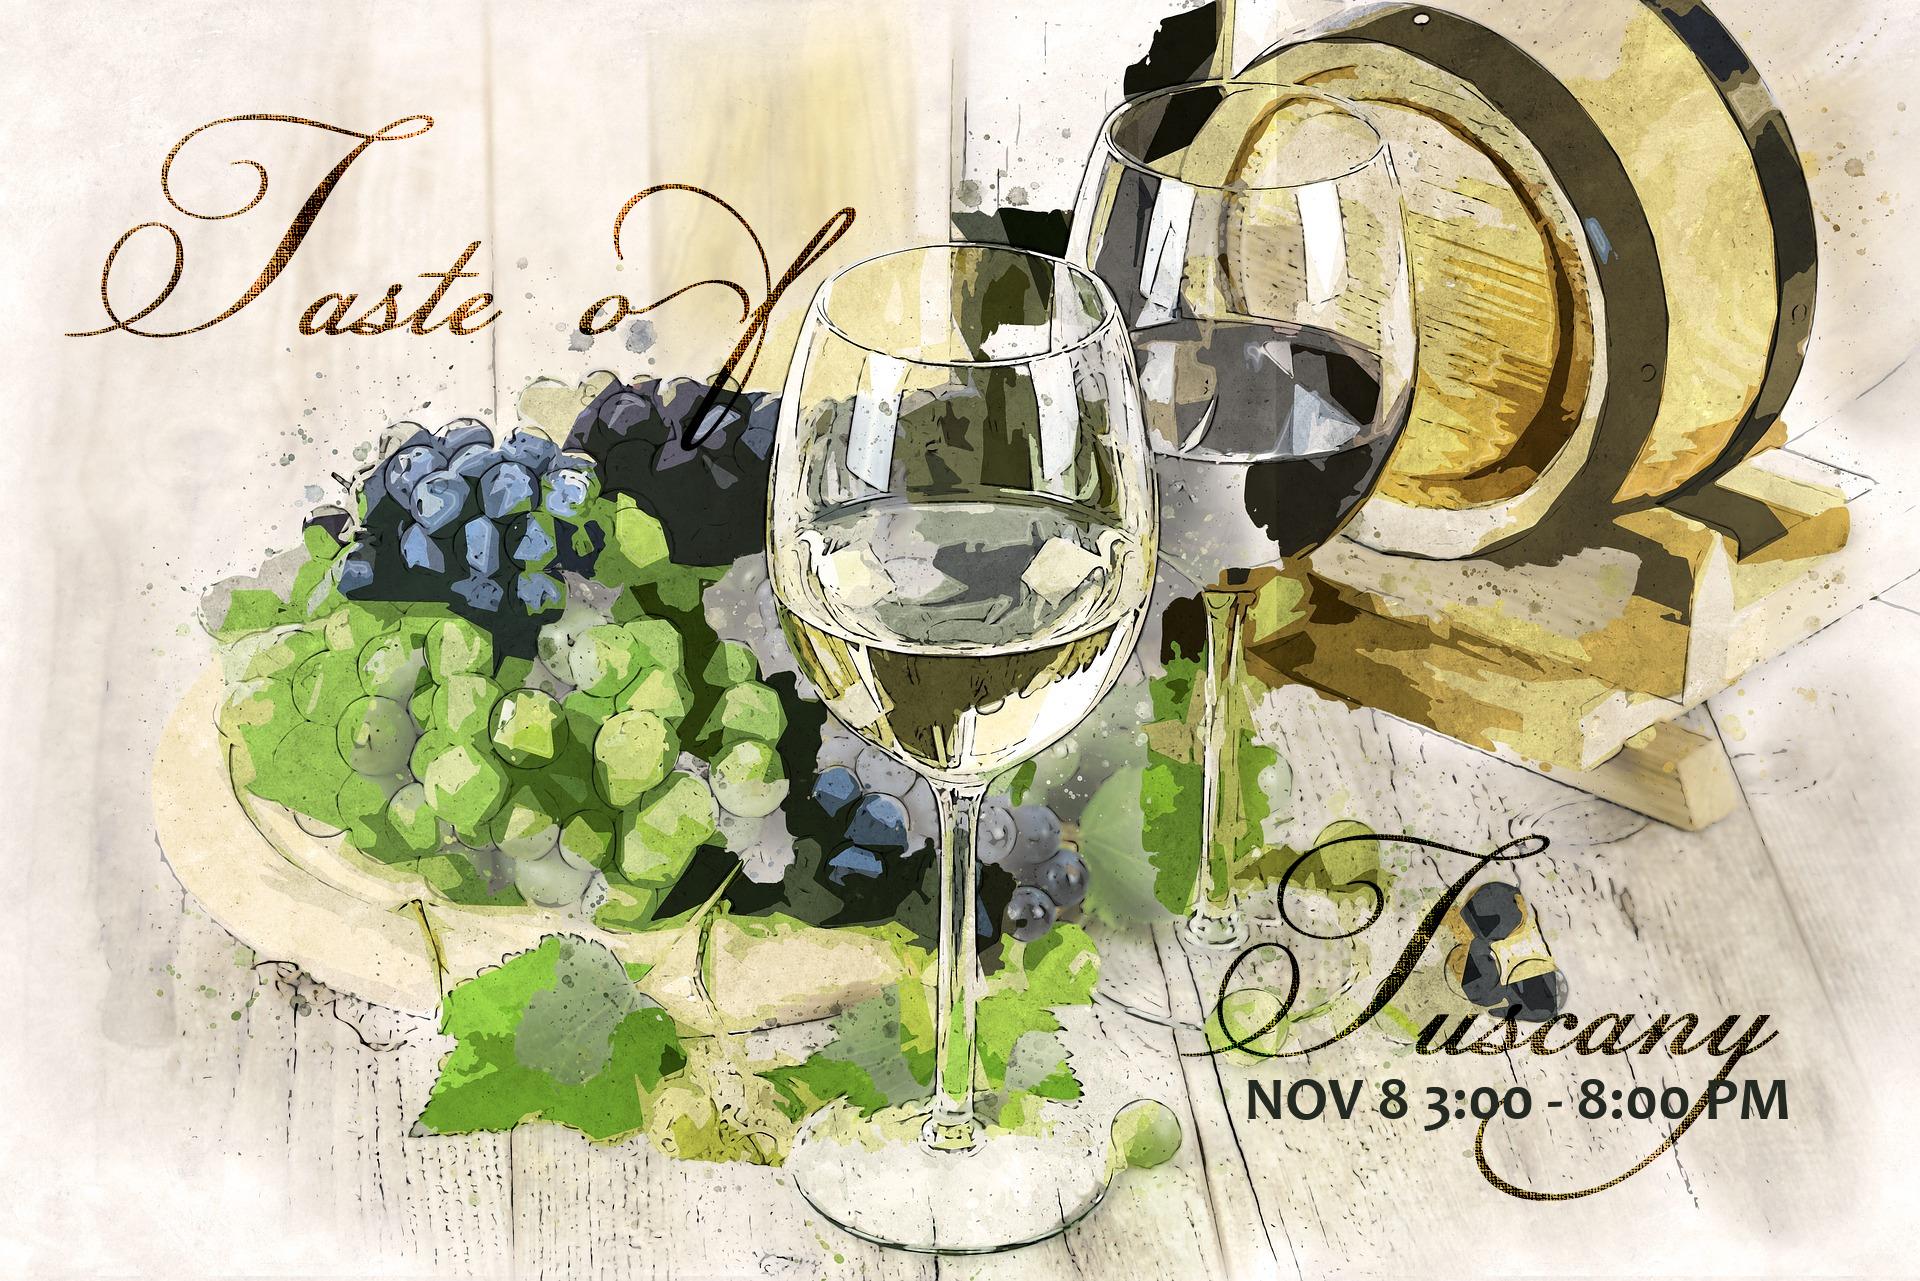 Taste Of Tuscany Nov 8 Wines